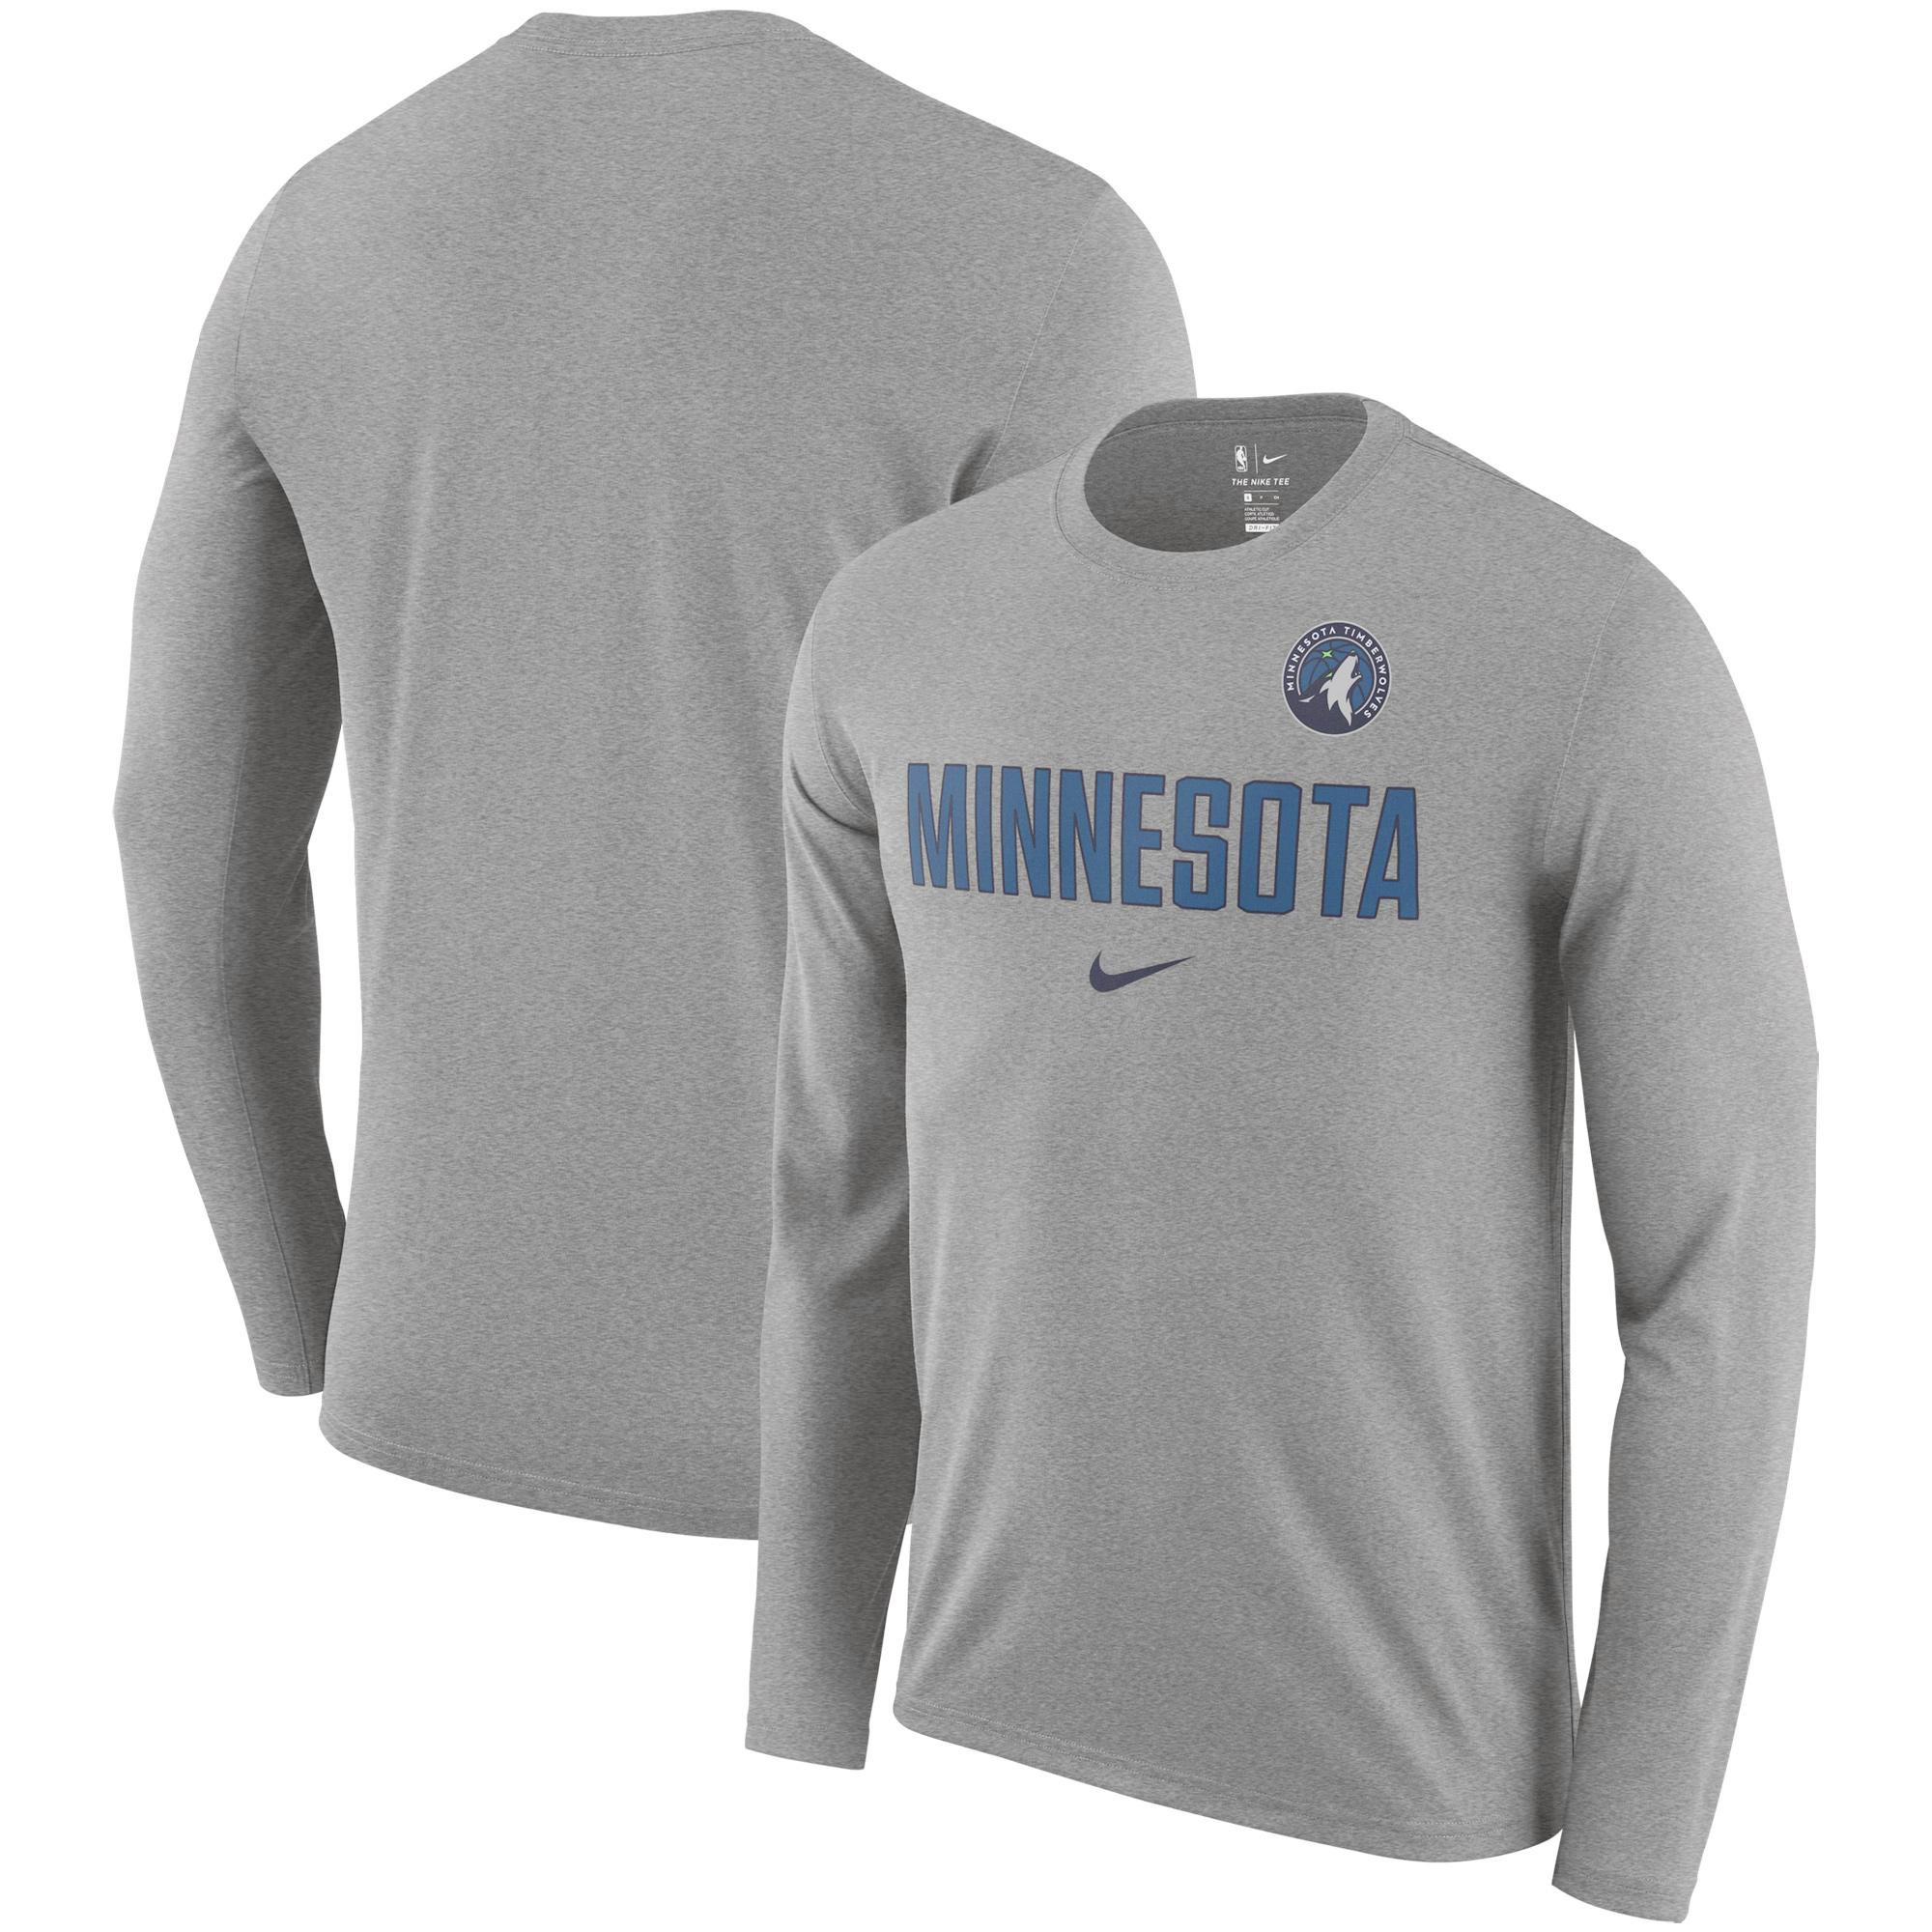 Minnesota Timberwolves Nike Essential Facility Slub Performance Long Sleeve T-Shirt - Heathered Charcoal